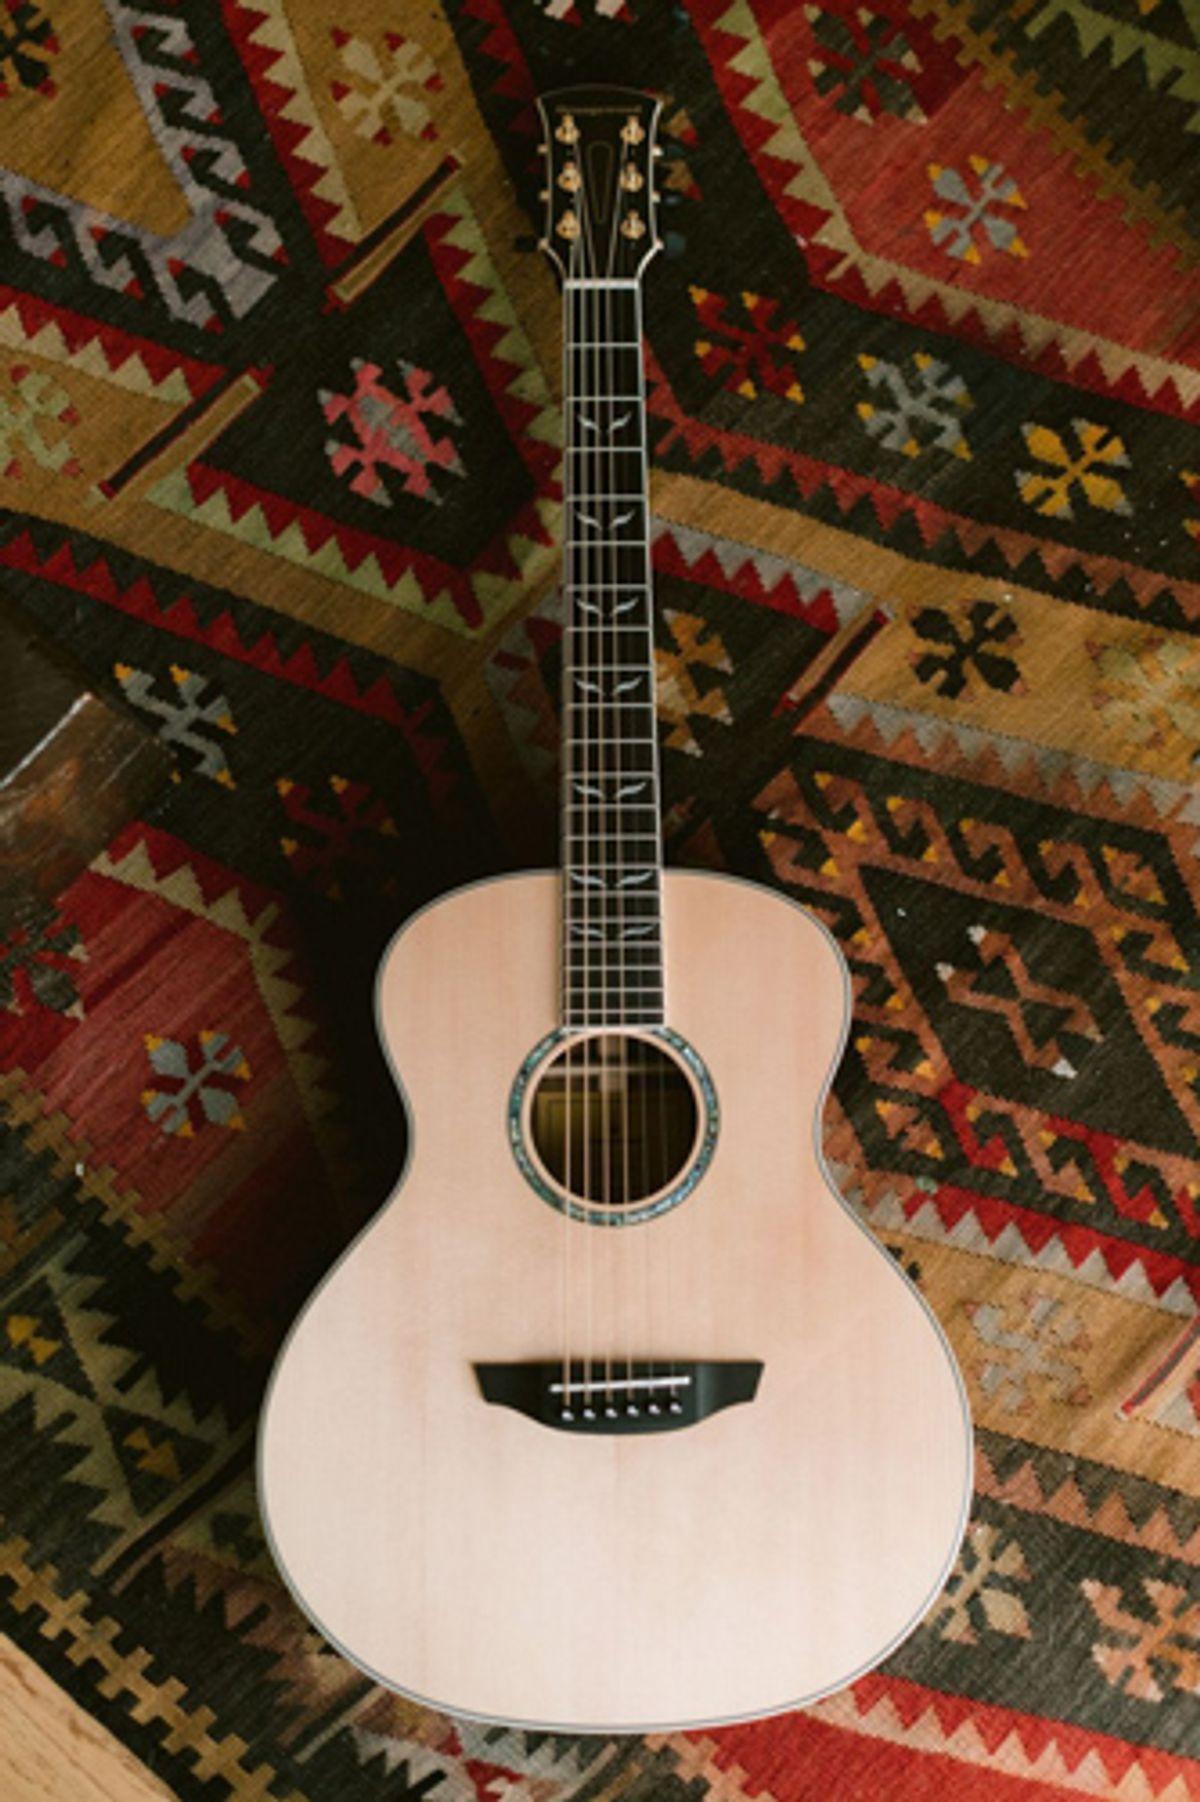 Orangewood Introduces First Nylon-String Guitar